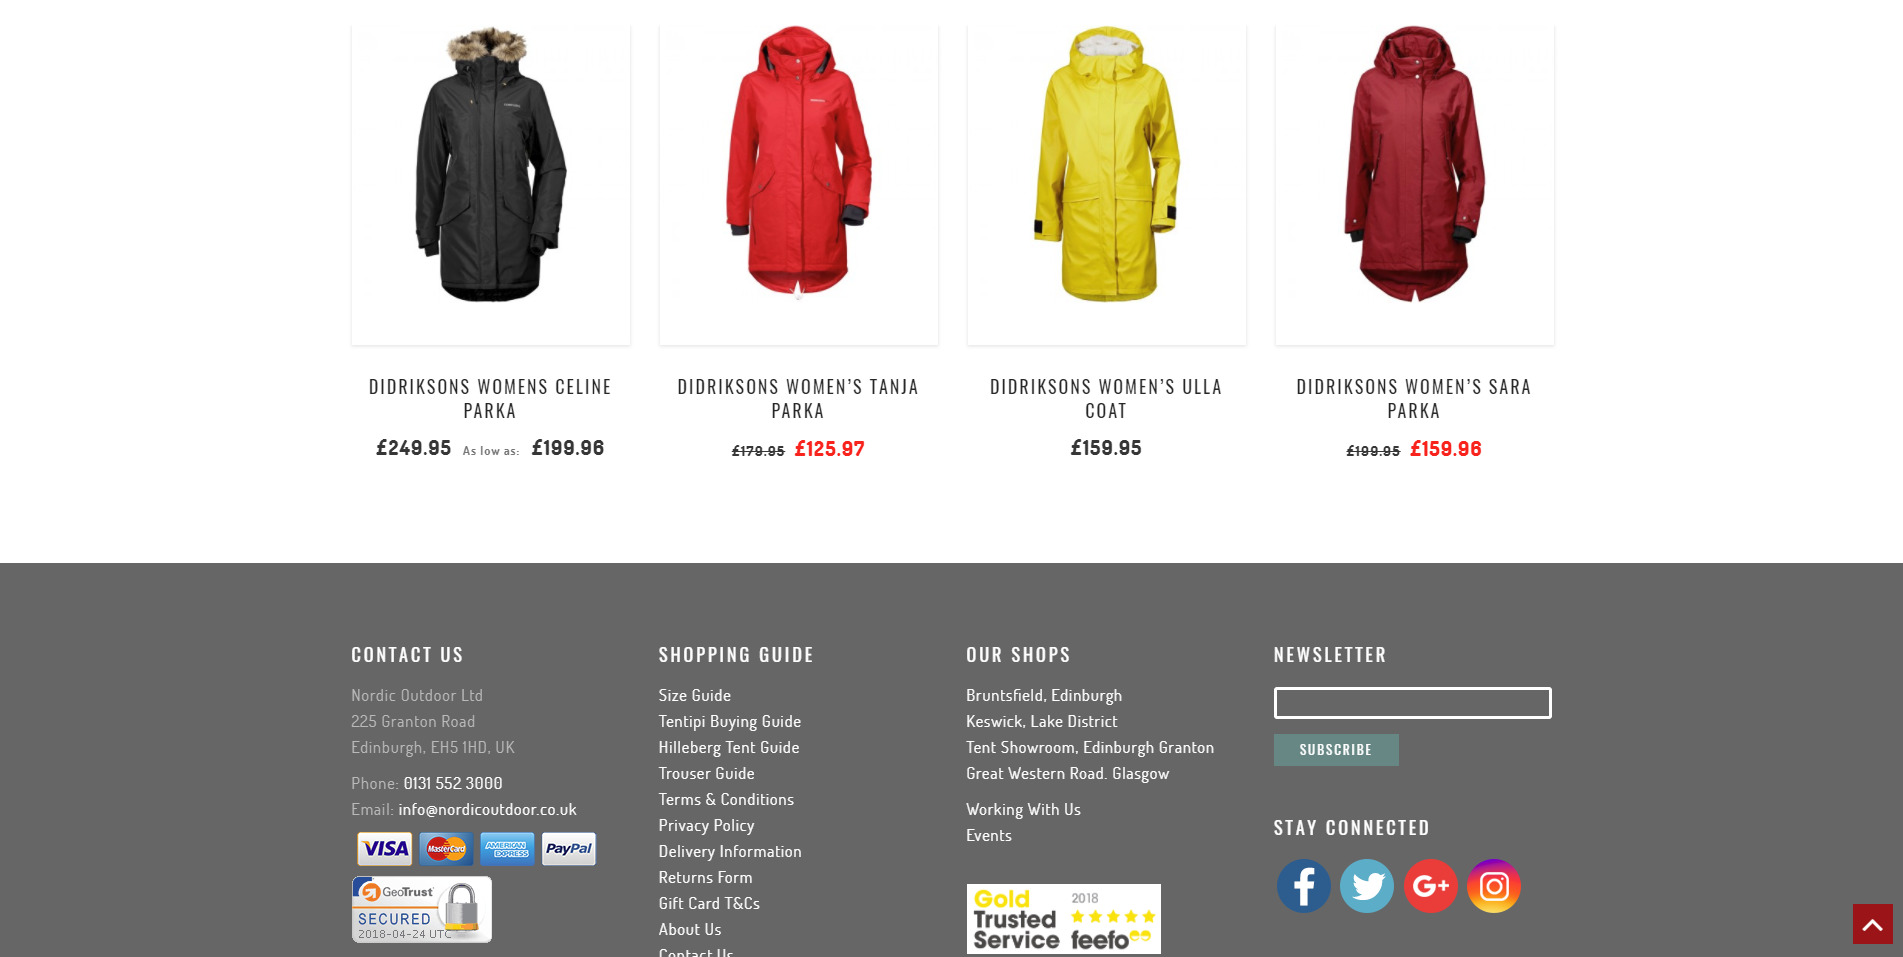 Didriksons-Women's-Ulla-Coat-Wind-Waterproof-Galon®-Jacket-Nordic-Outdoor-1